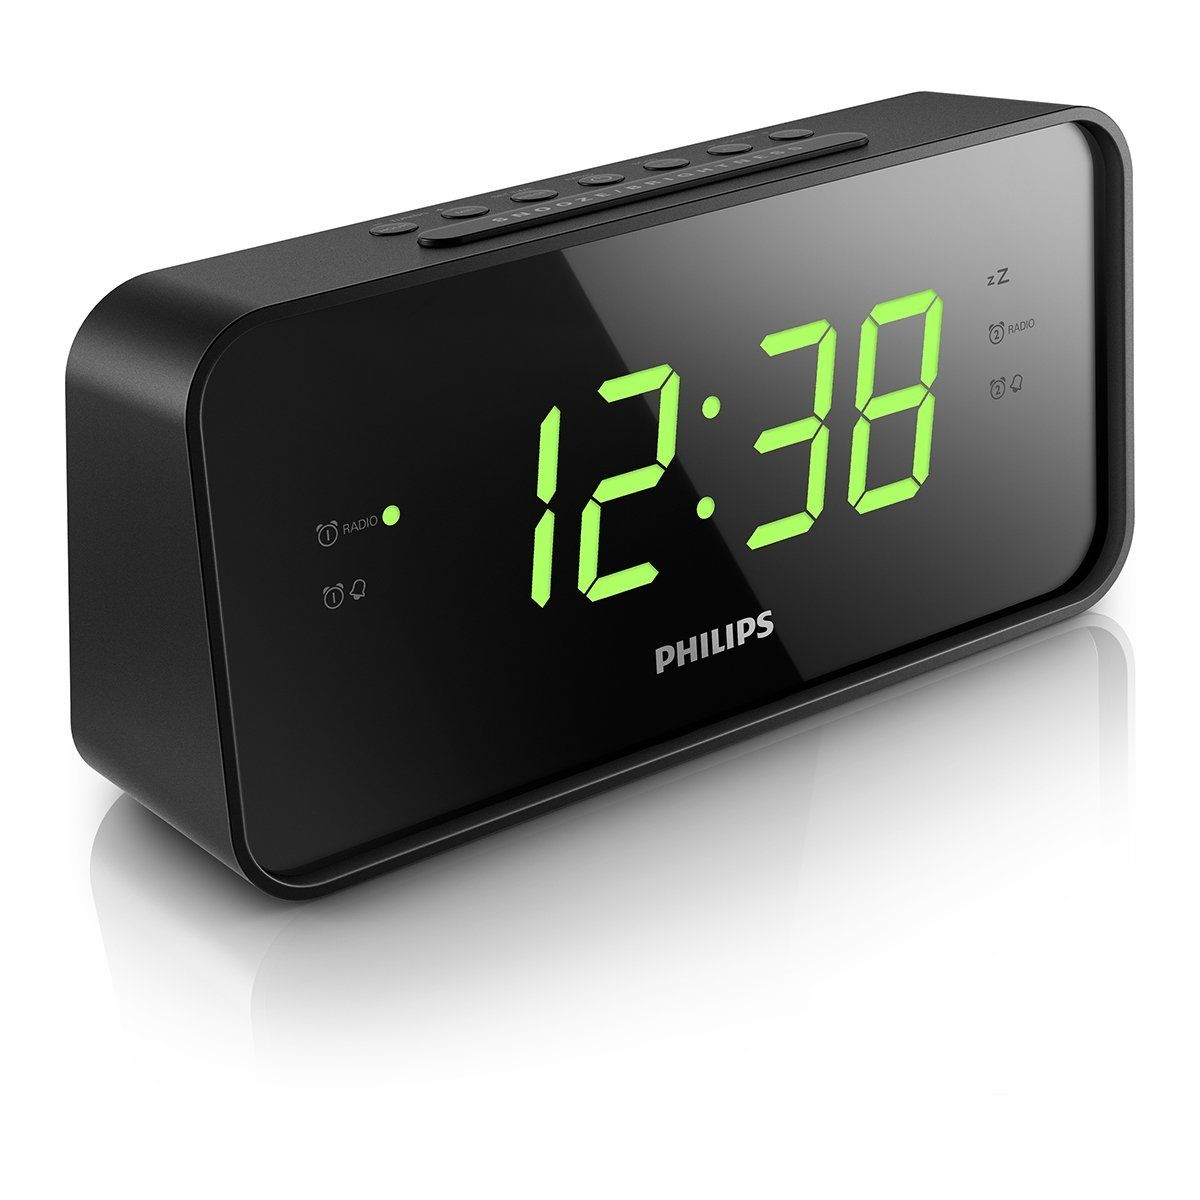 Philips AJ3232B/37 Big Display Clock Radio